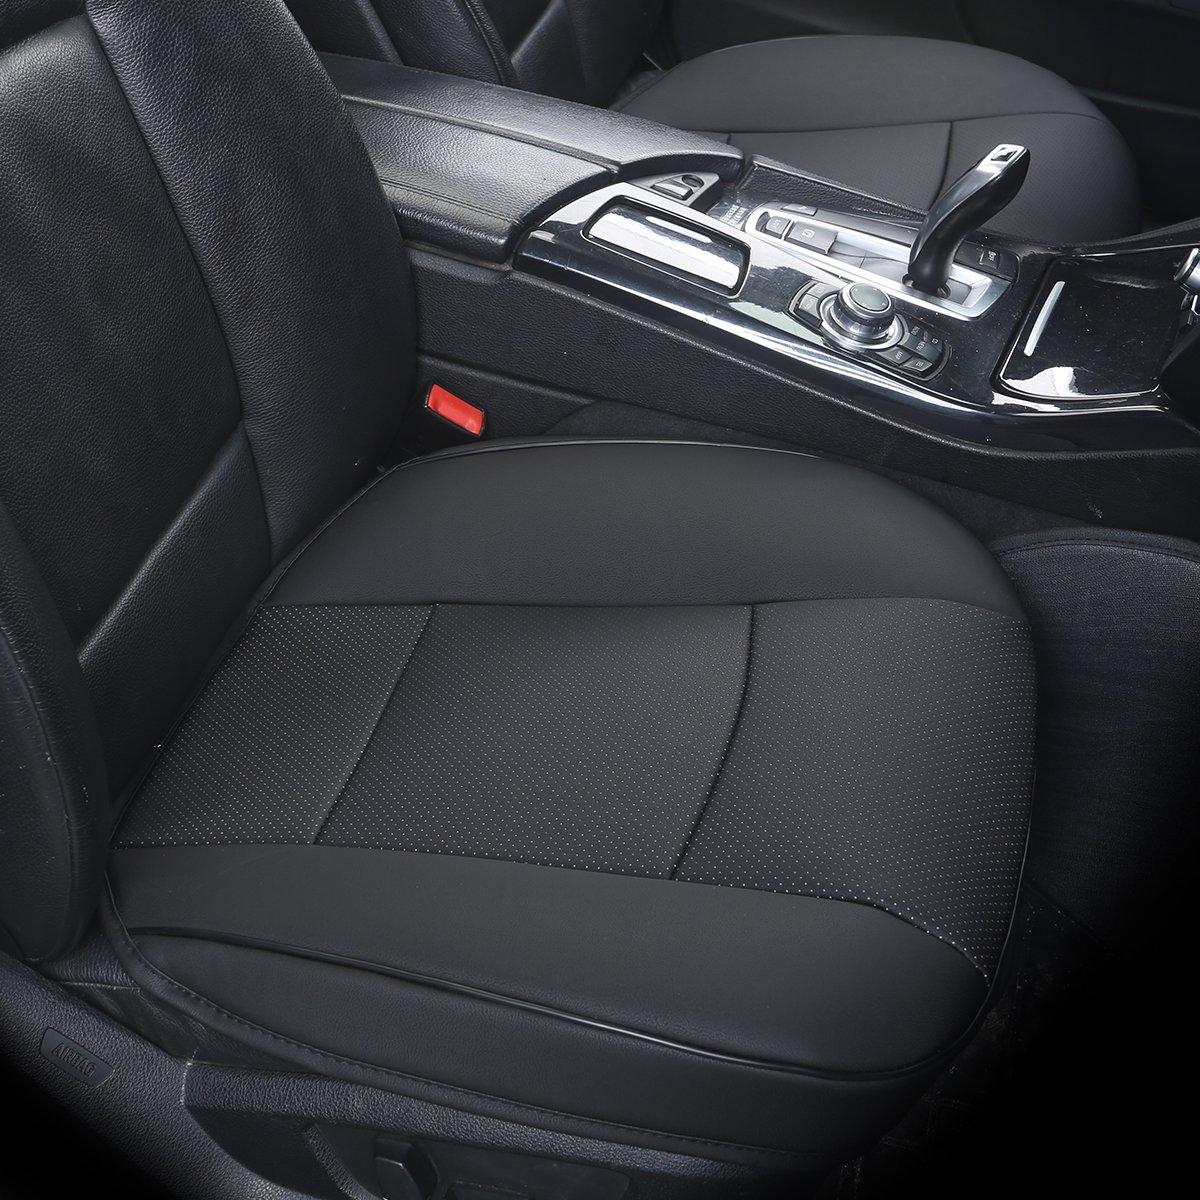 Leather Seat Pattern 1000 Free Patterns